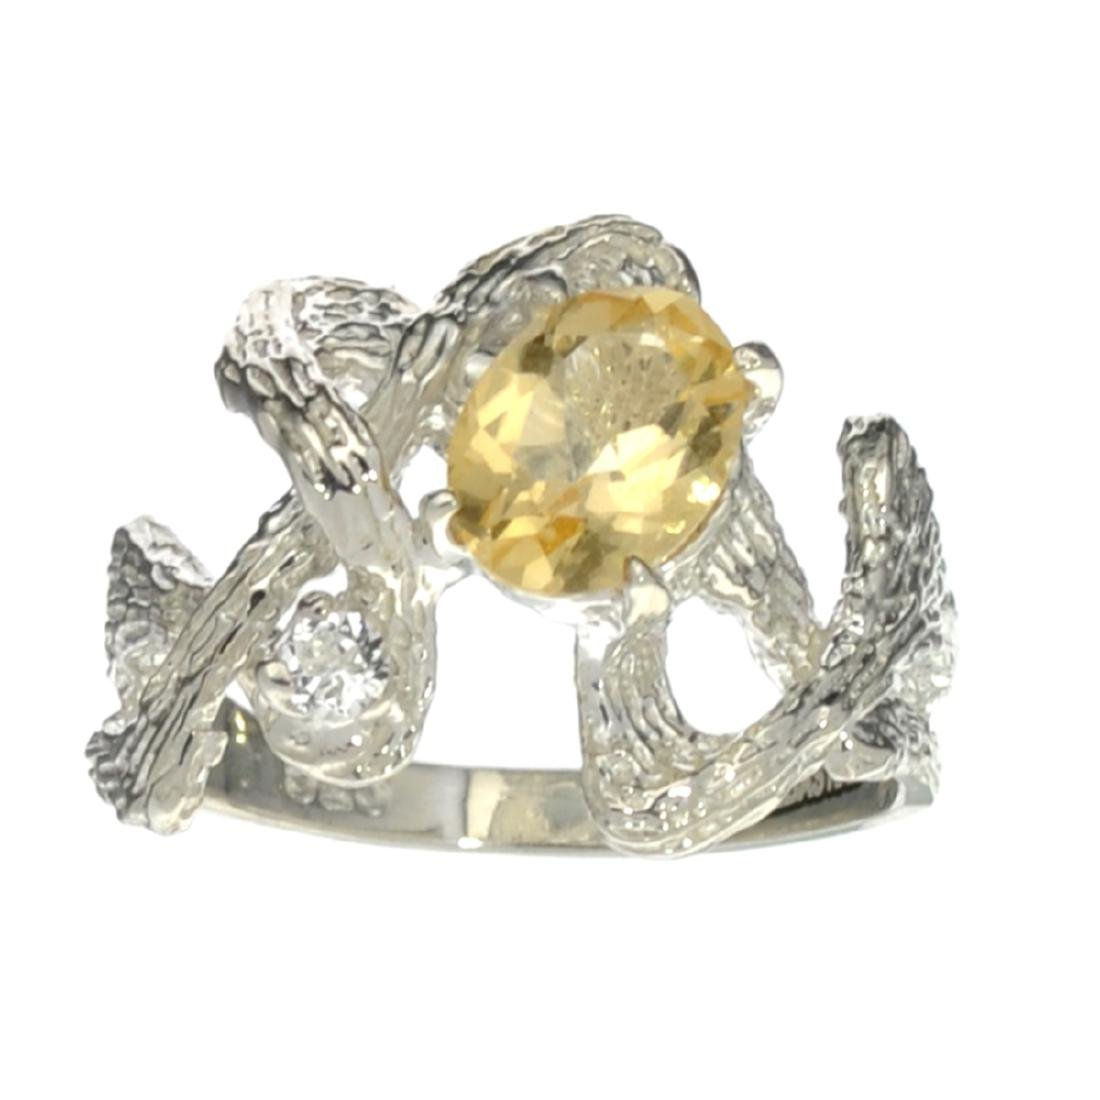 APP: 0.5k Fine Jewelry Designer Sebastian, 1.23CT